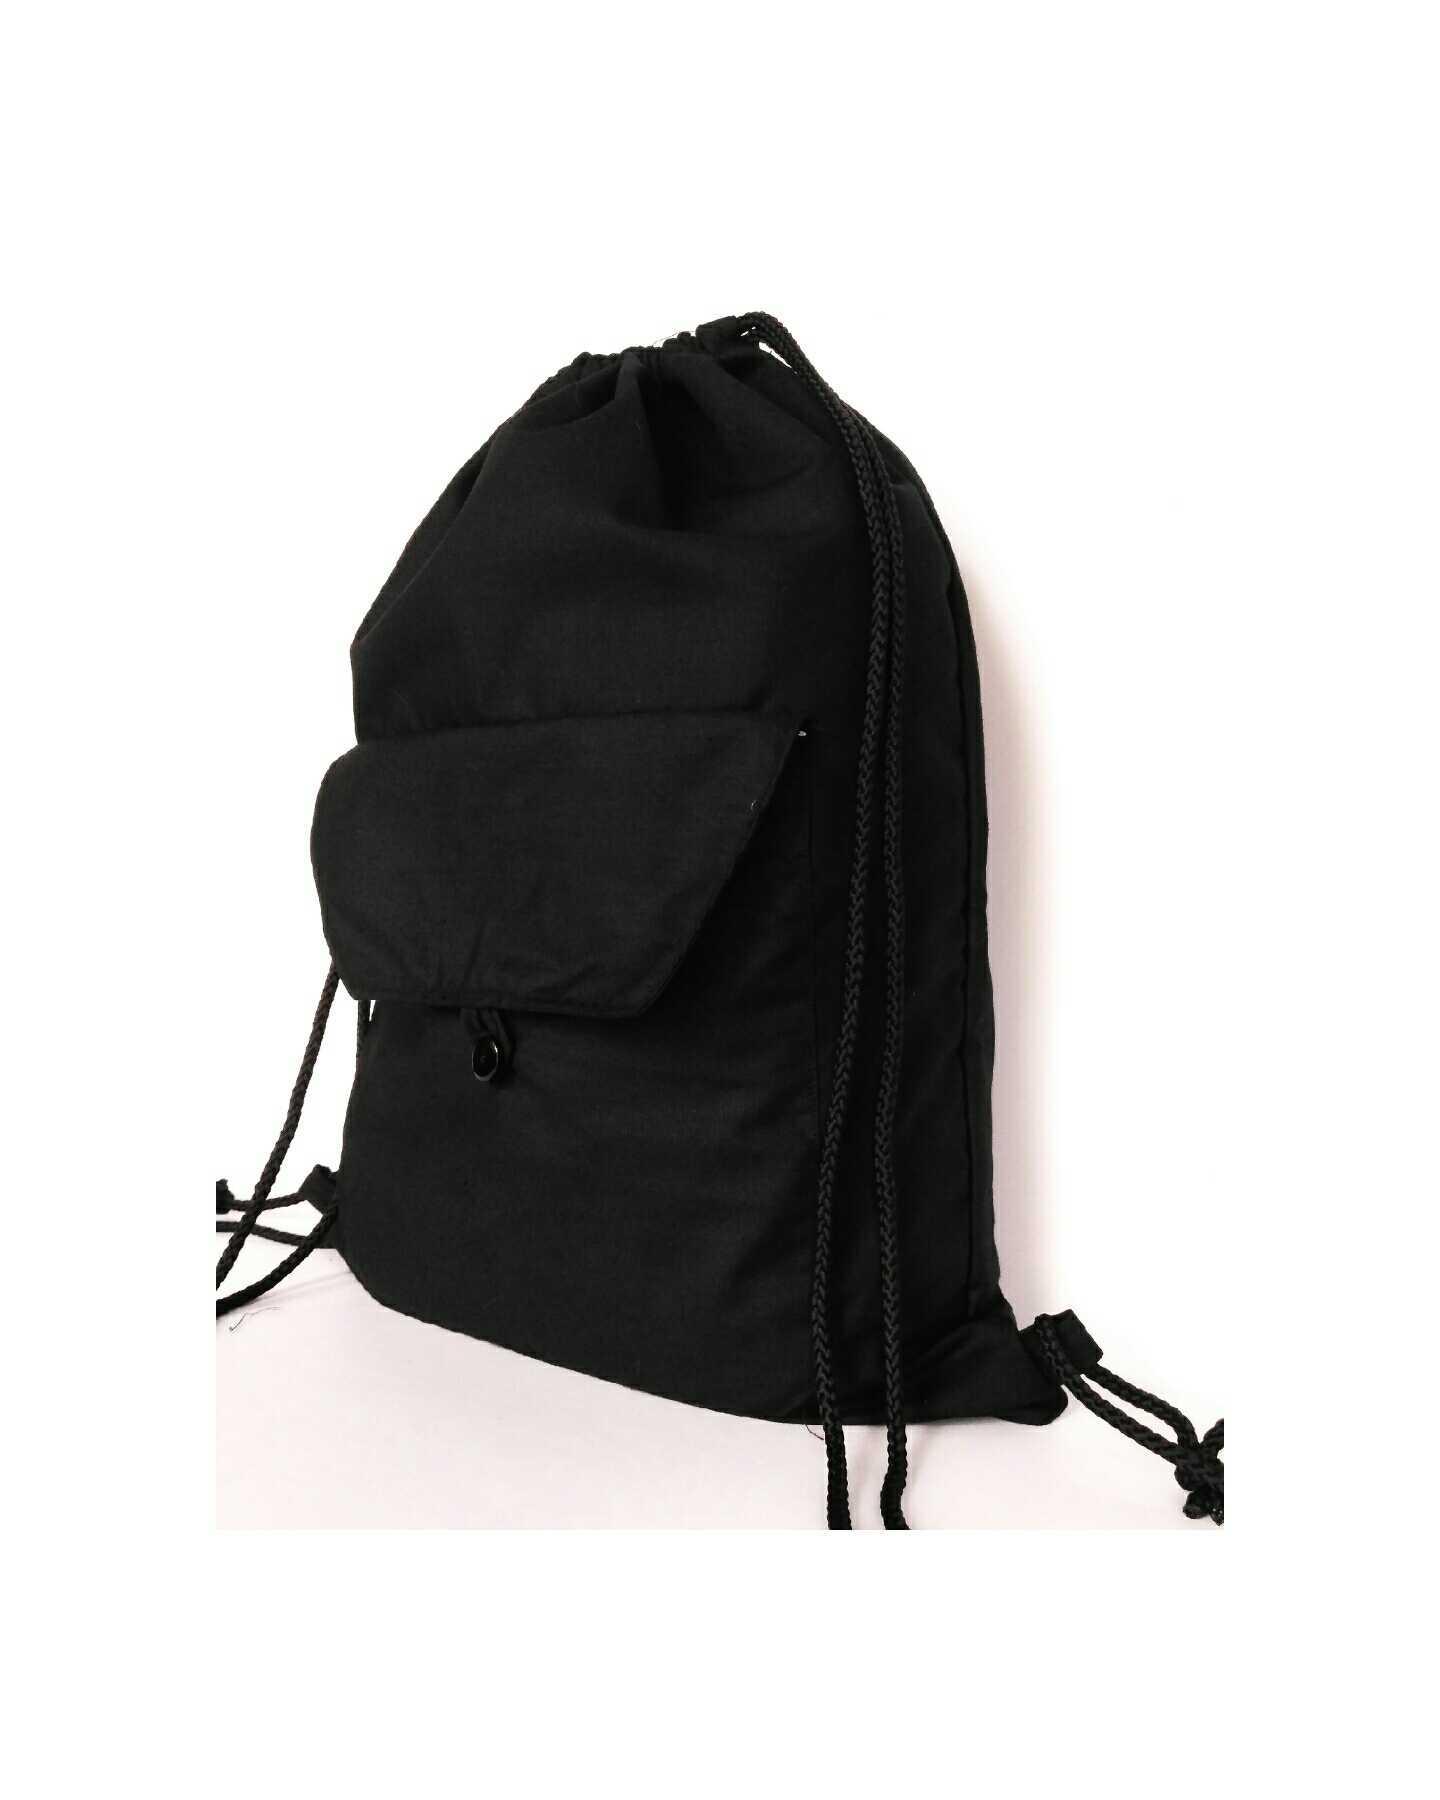 Tas Serut / String bag / Tas futsal / Tas pria / Tas wanita / Tas sekolah / Back pack / Tas punggung / Sack bag